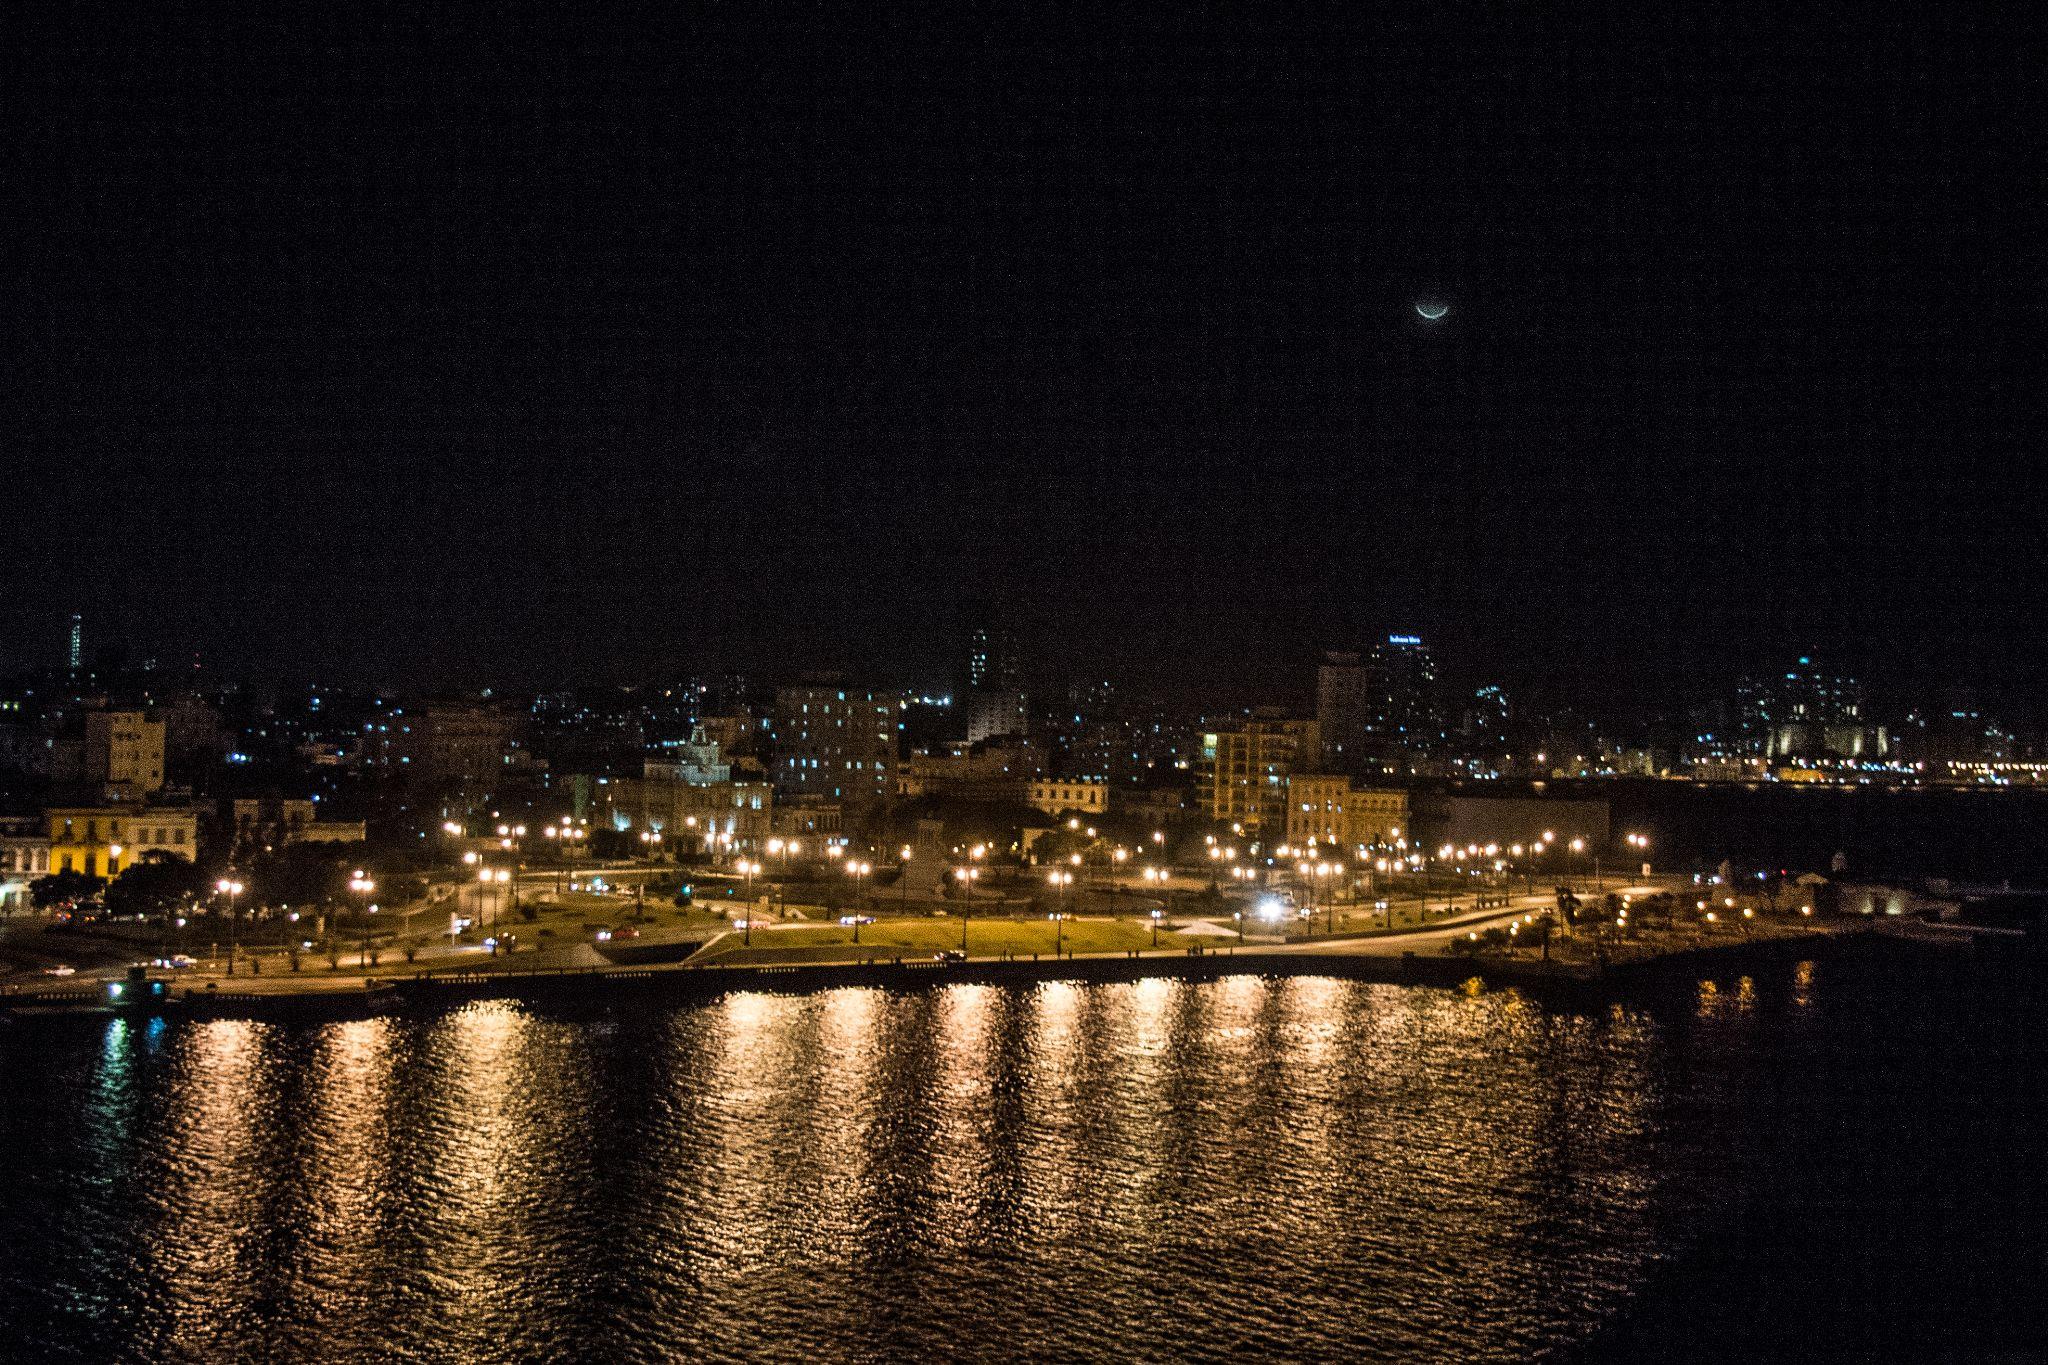 La Habana by marthasofia.prietoortiz